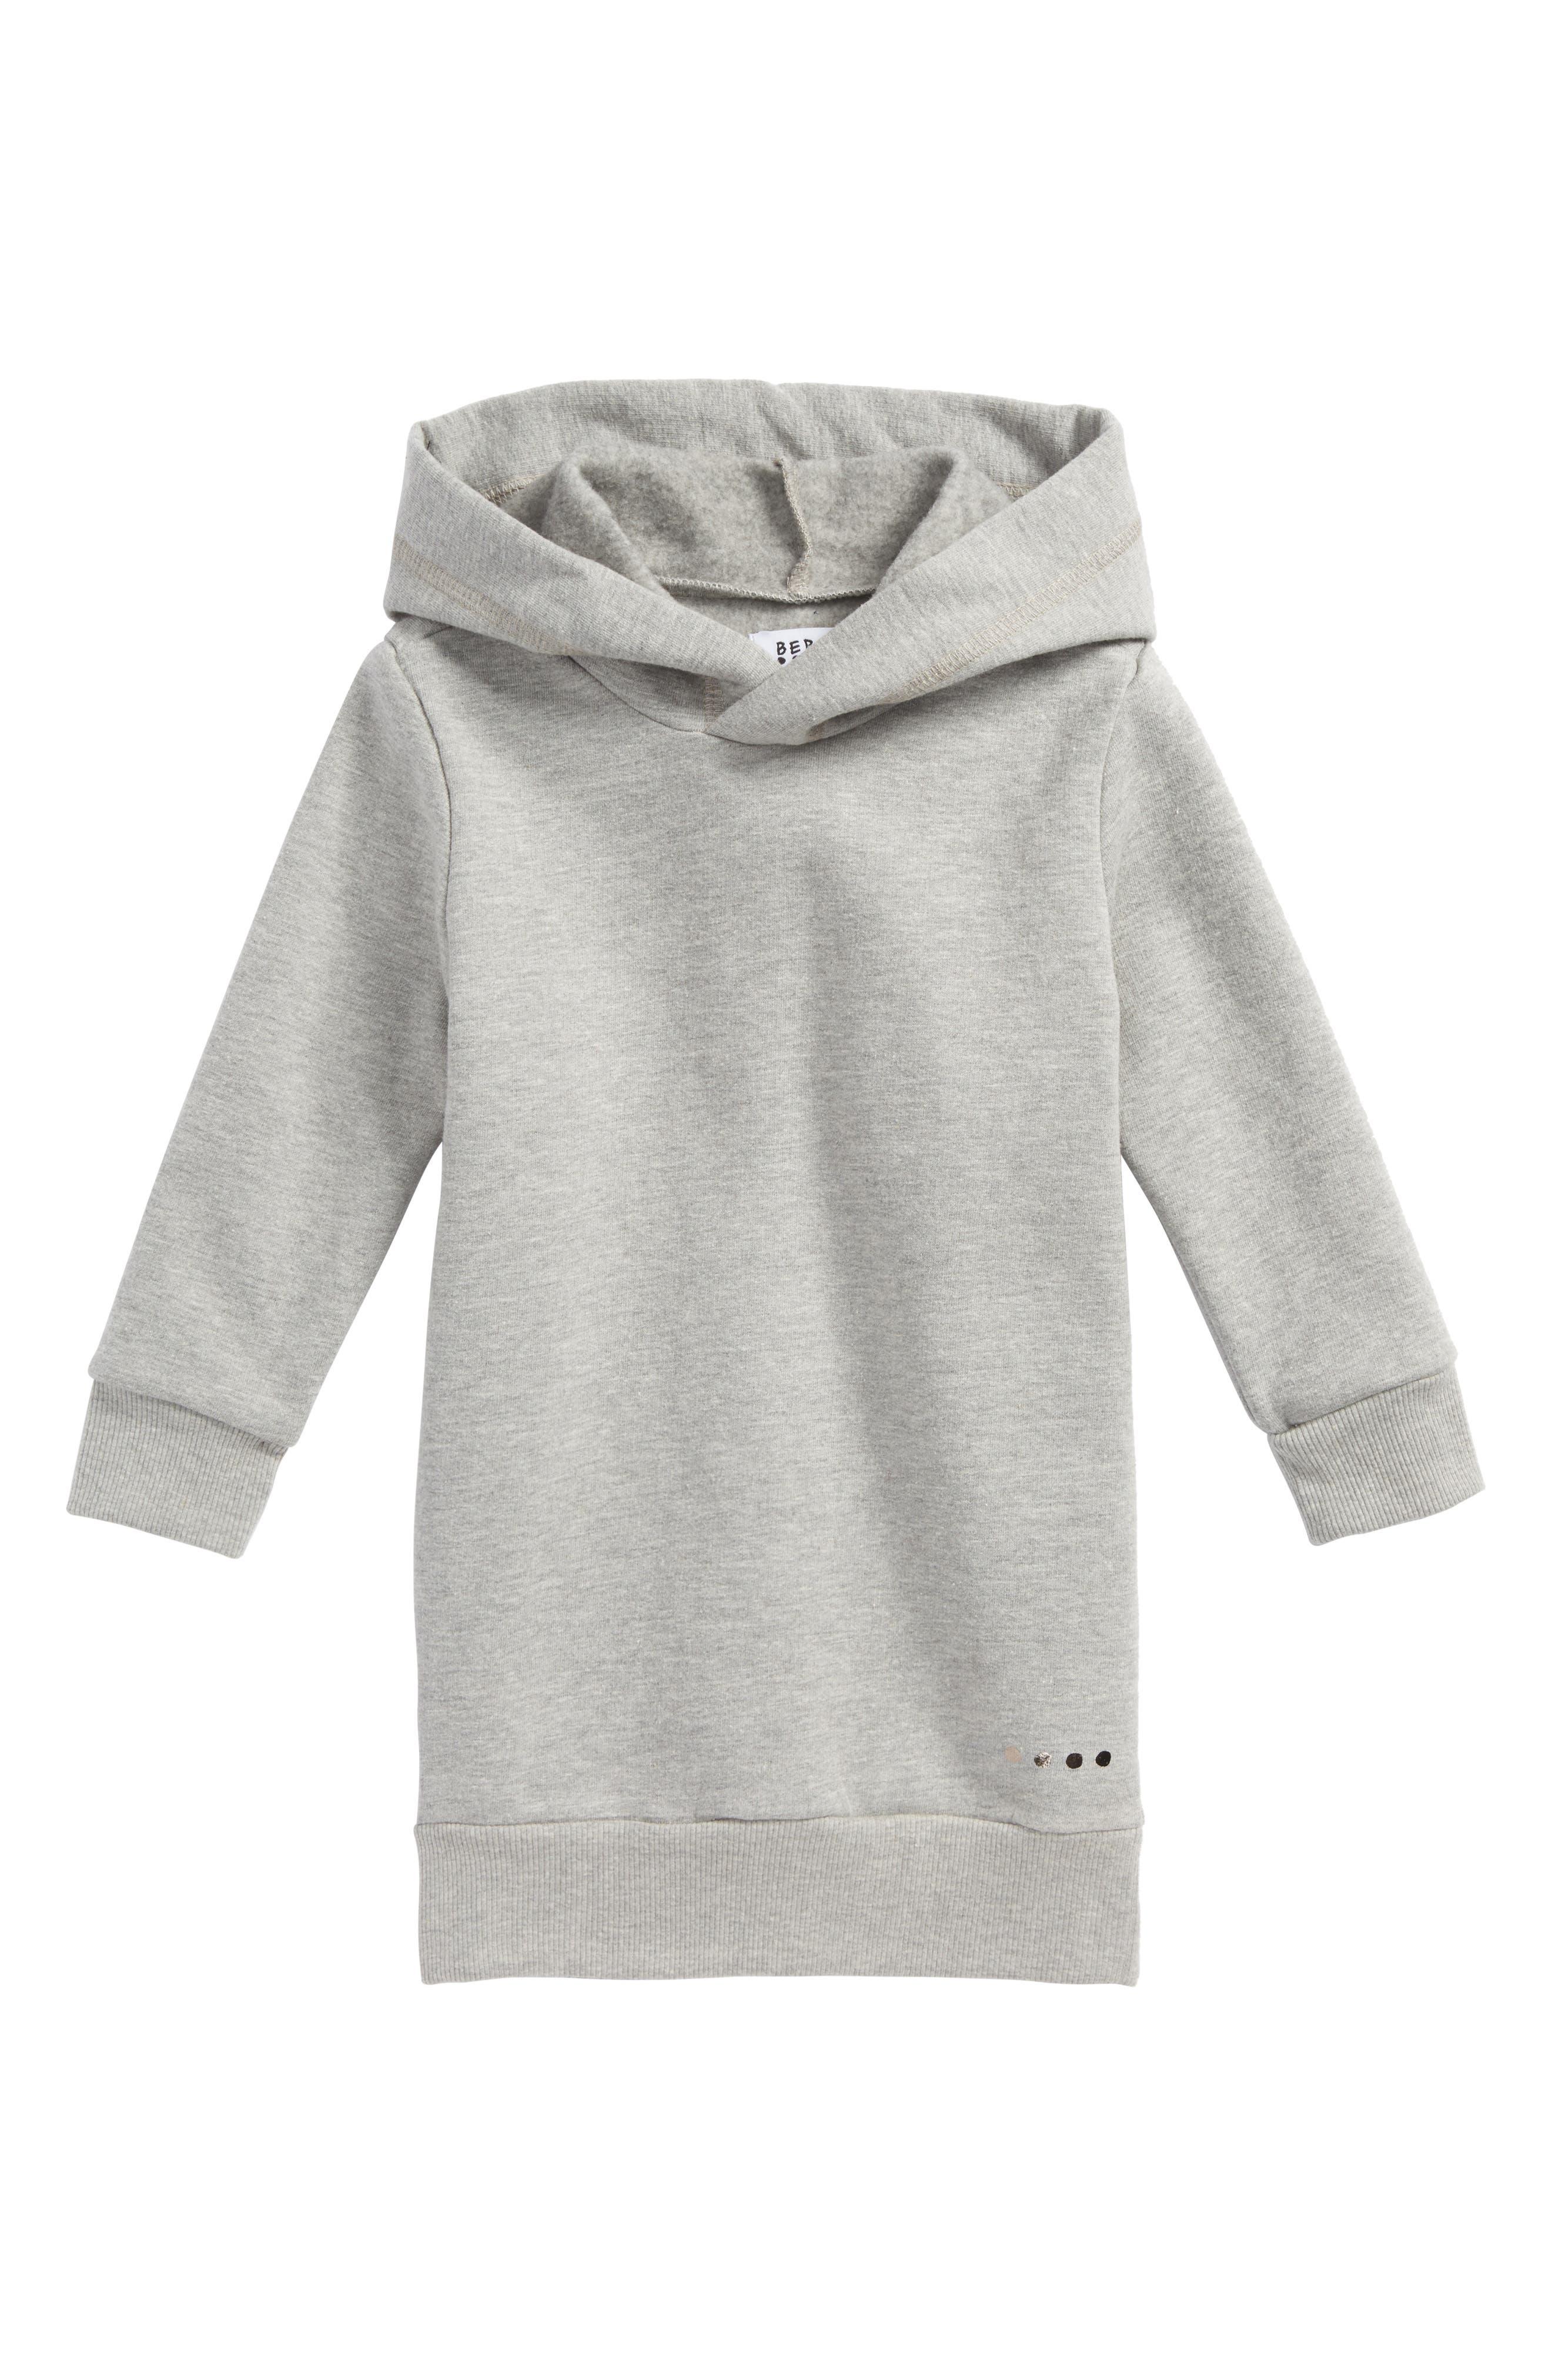 Main Image - Beru Luna Hooded Sweatshirt Dress (Toddler Girls & Little Girls)